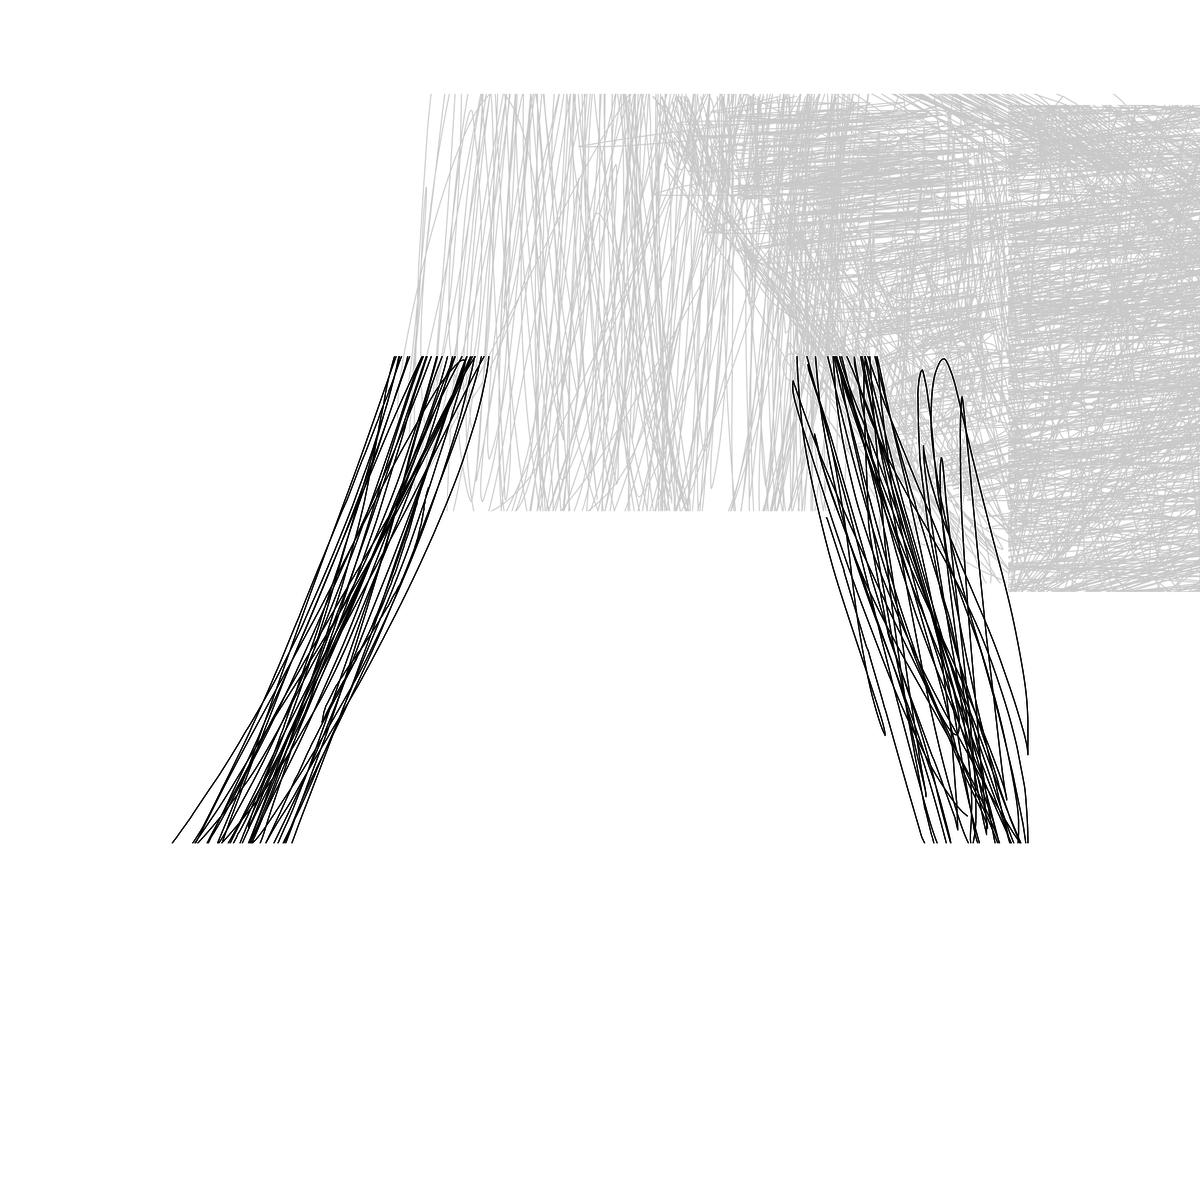 BAAAM drawing#19199 lat:60.3897933959960940lng: 25.6664619445800780